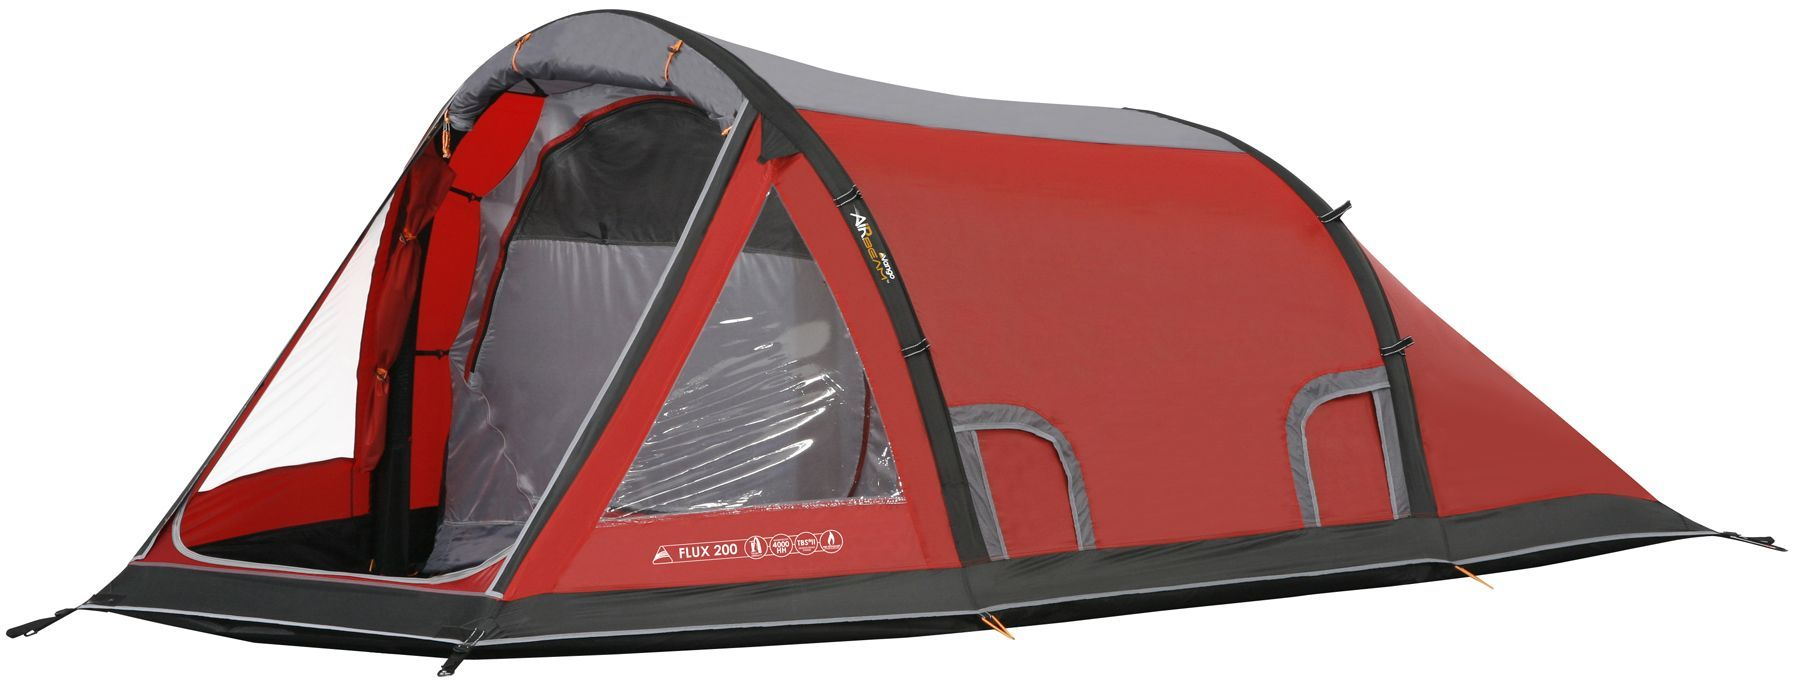 Vango Flux 200 Airbeam Tunnel Tent by Vango for £225.00